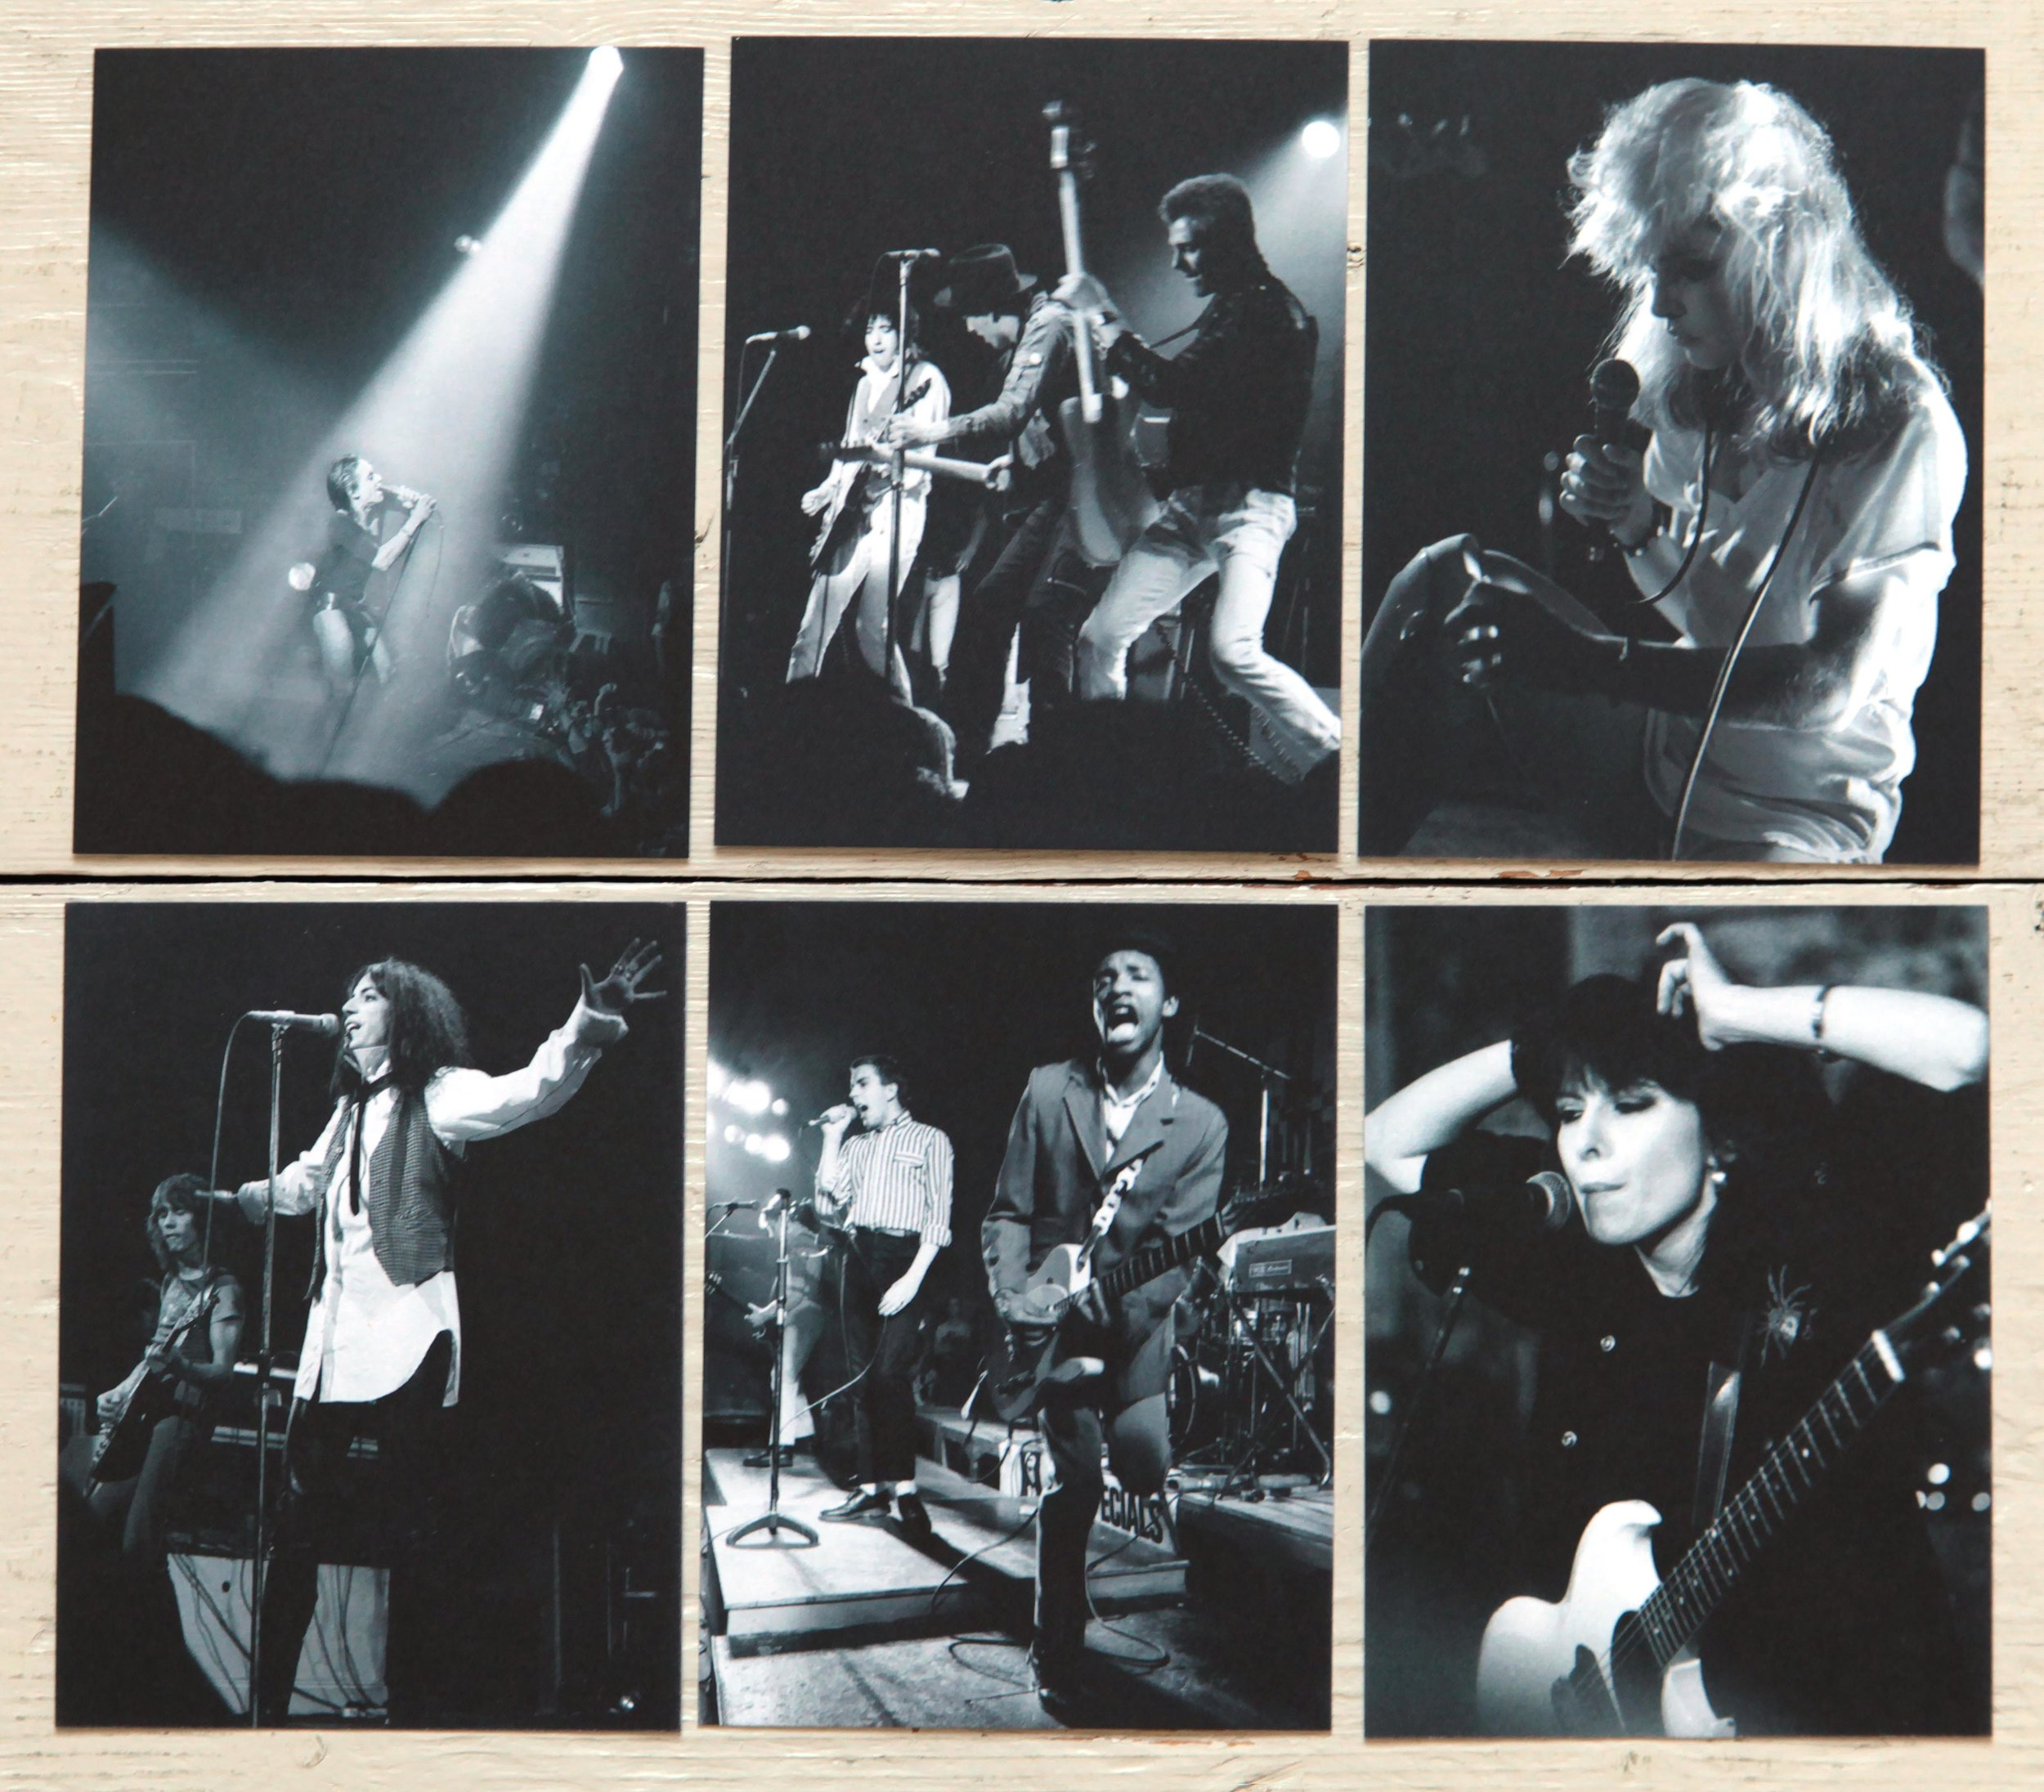 Phil Grey's Postcards. Blondie, The Clash, Patti Smith, Iggy Pop, The Specials, Chrissie Hynde, The Pretenders